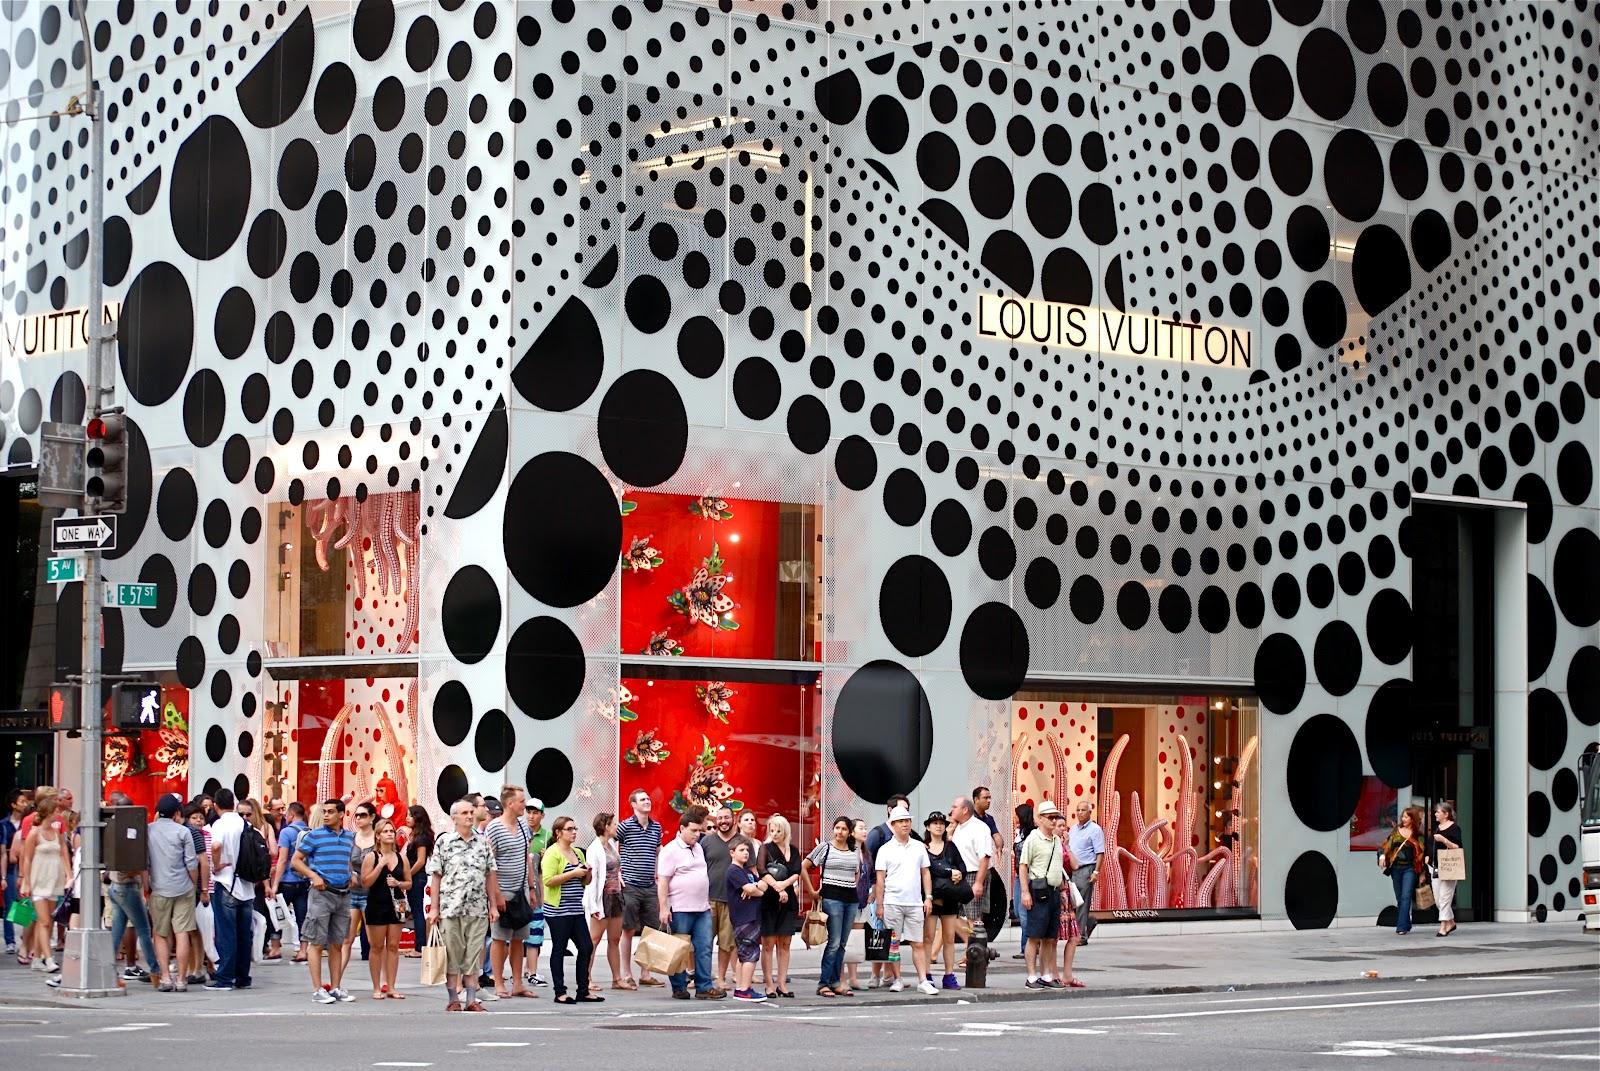 Yayoi Kusama installation and collaboration with Louis Vuitton